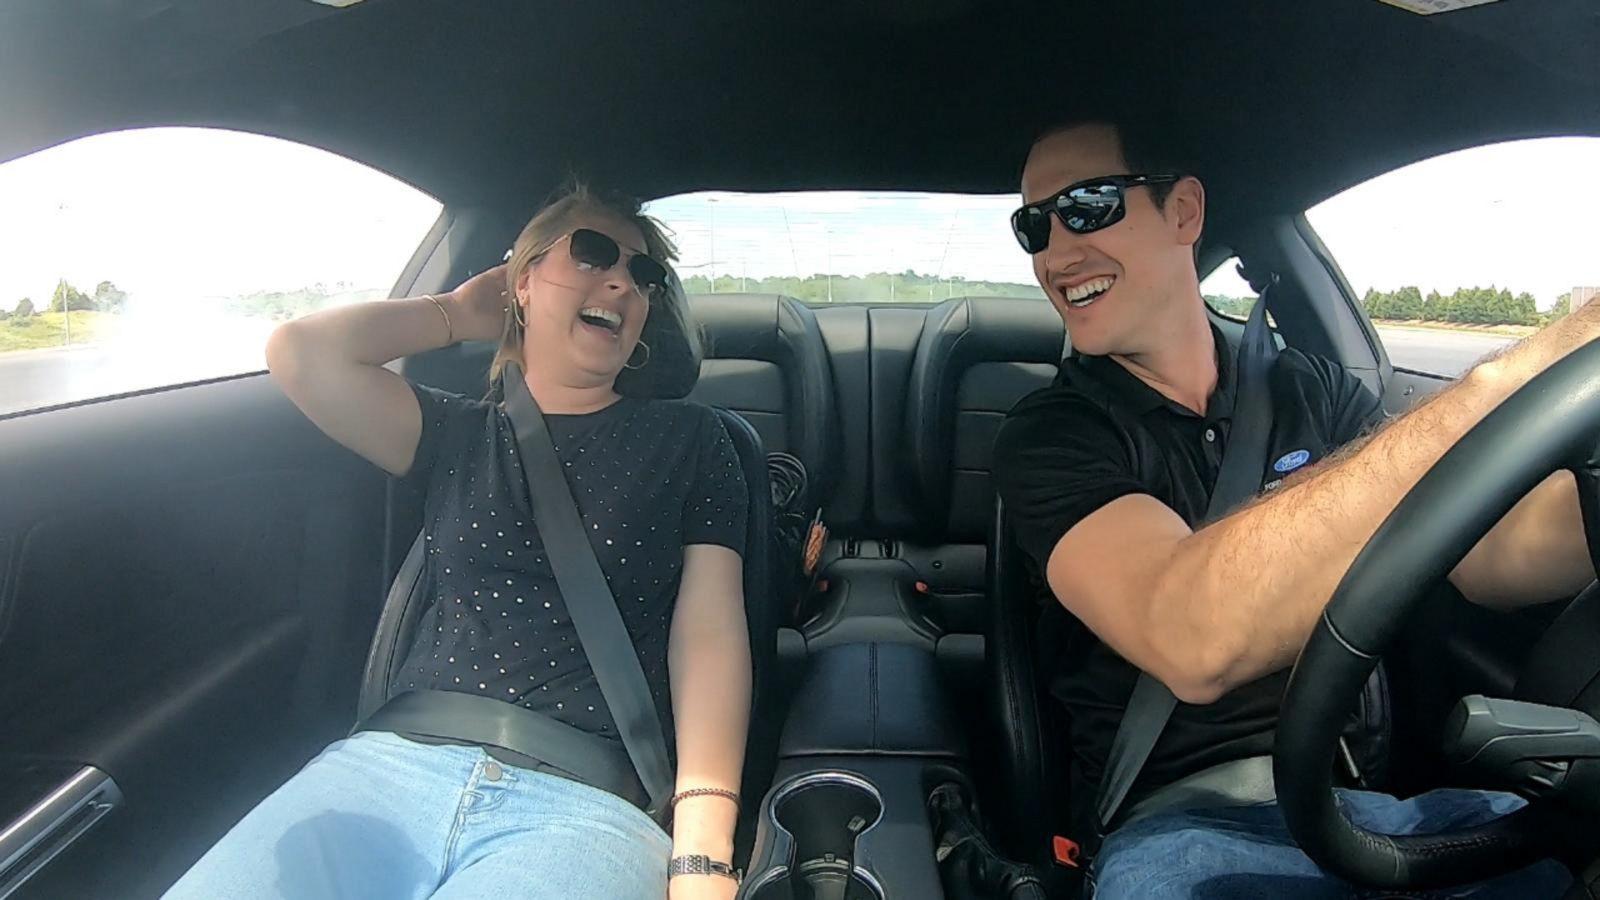 abcnews.go.com - Morgan Korn - NASCAR champion Joey Logano taught me how to drive stick